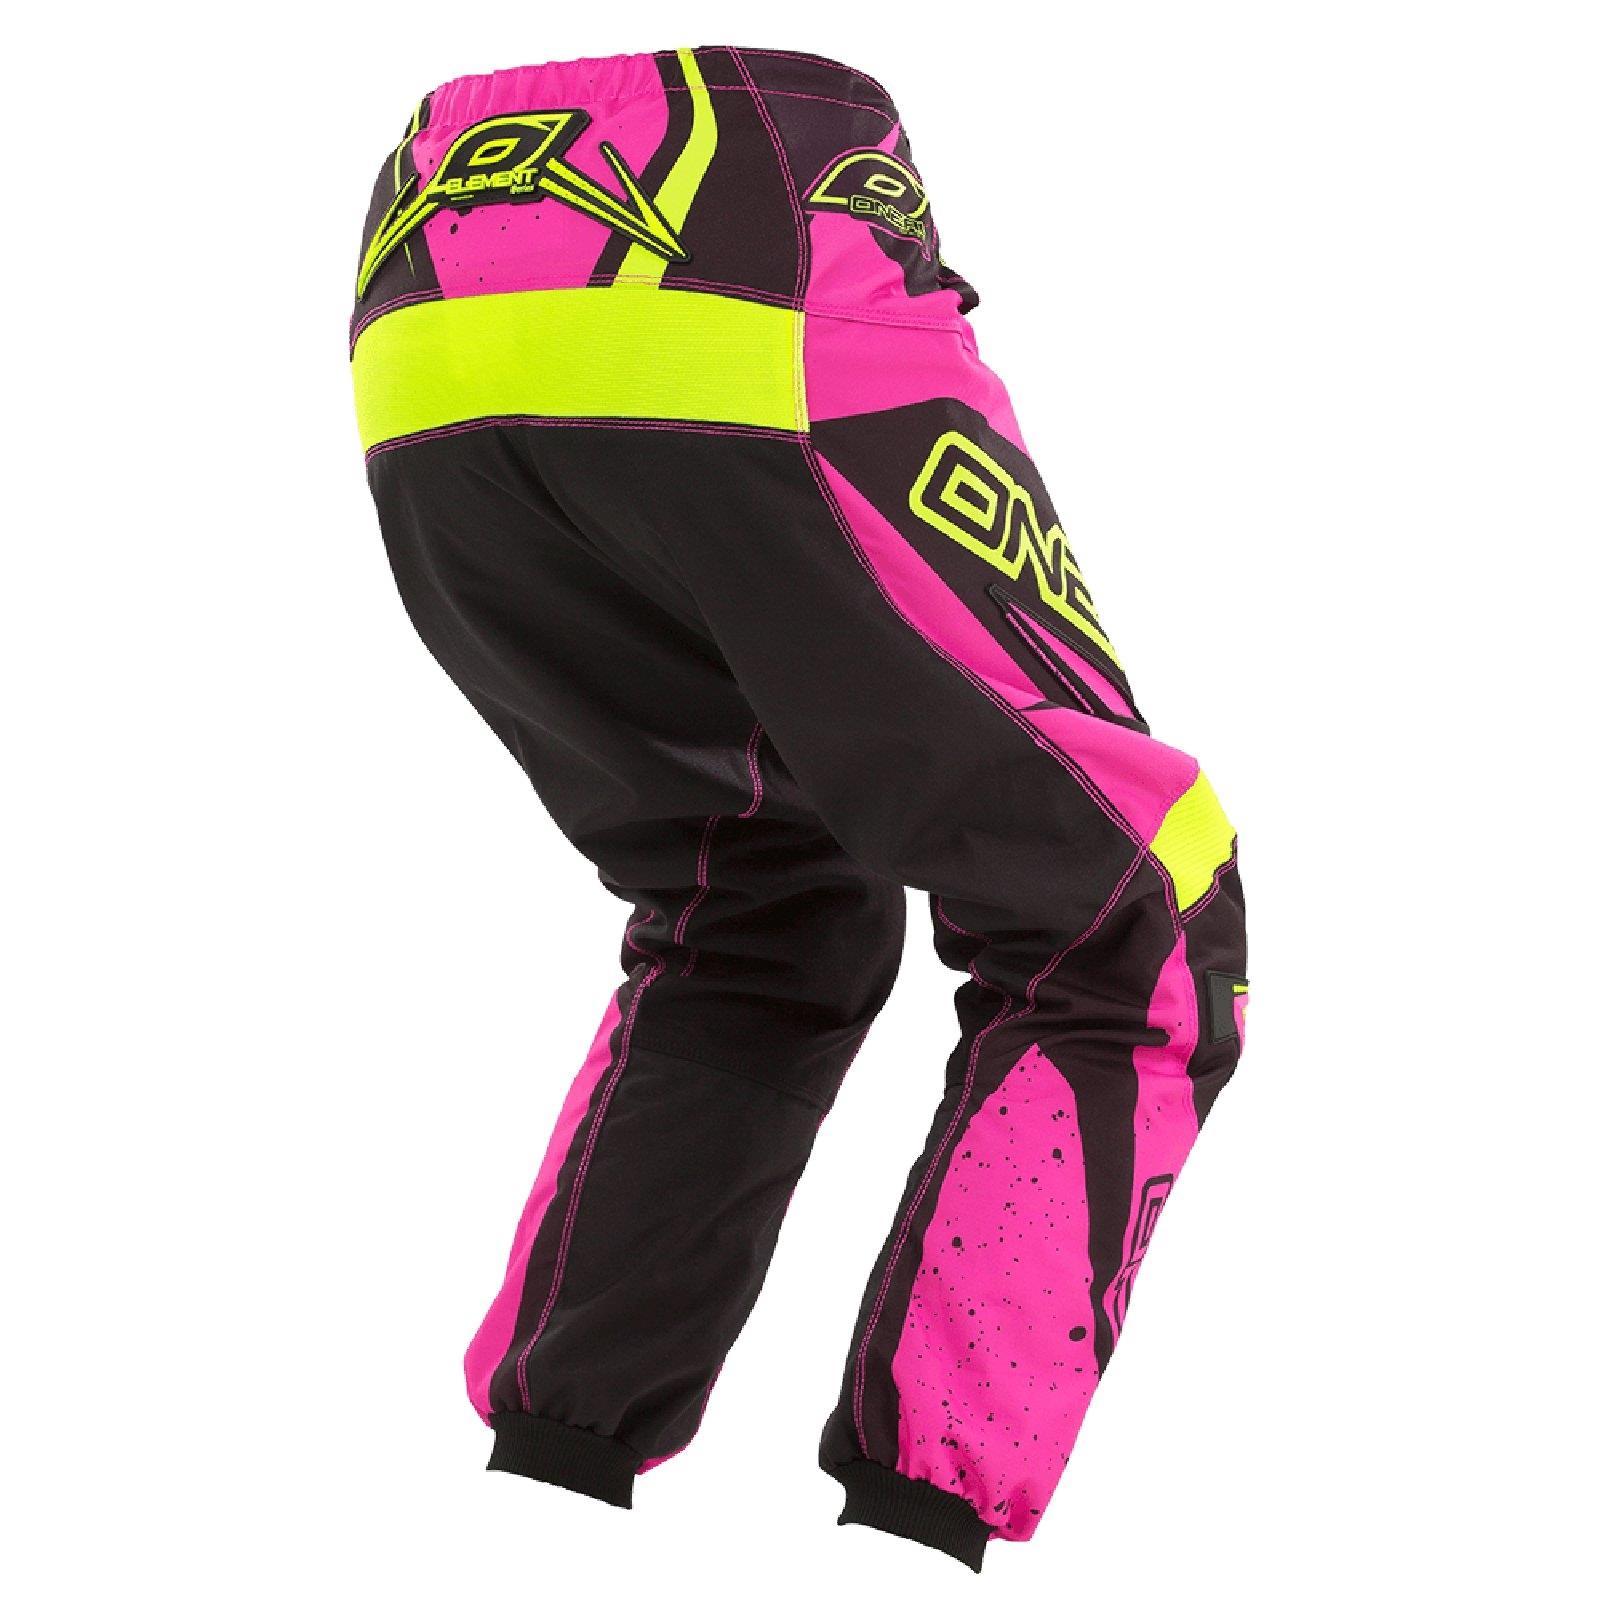 ONeal Element MX DAMEN Hose Racewear damen Rosa Moto Cross Cross Cross Enduro Mountainbike 93e145